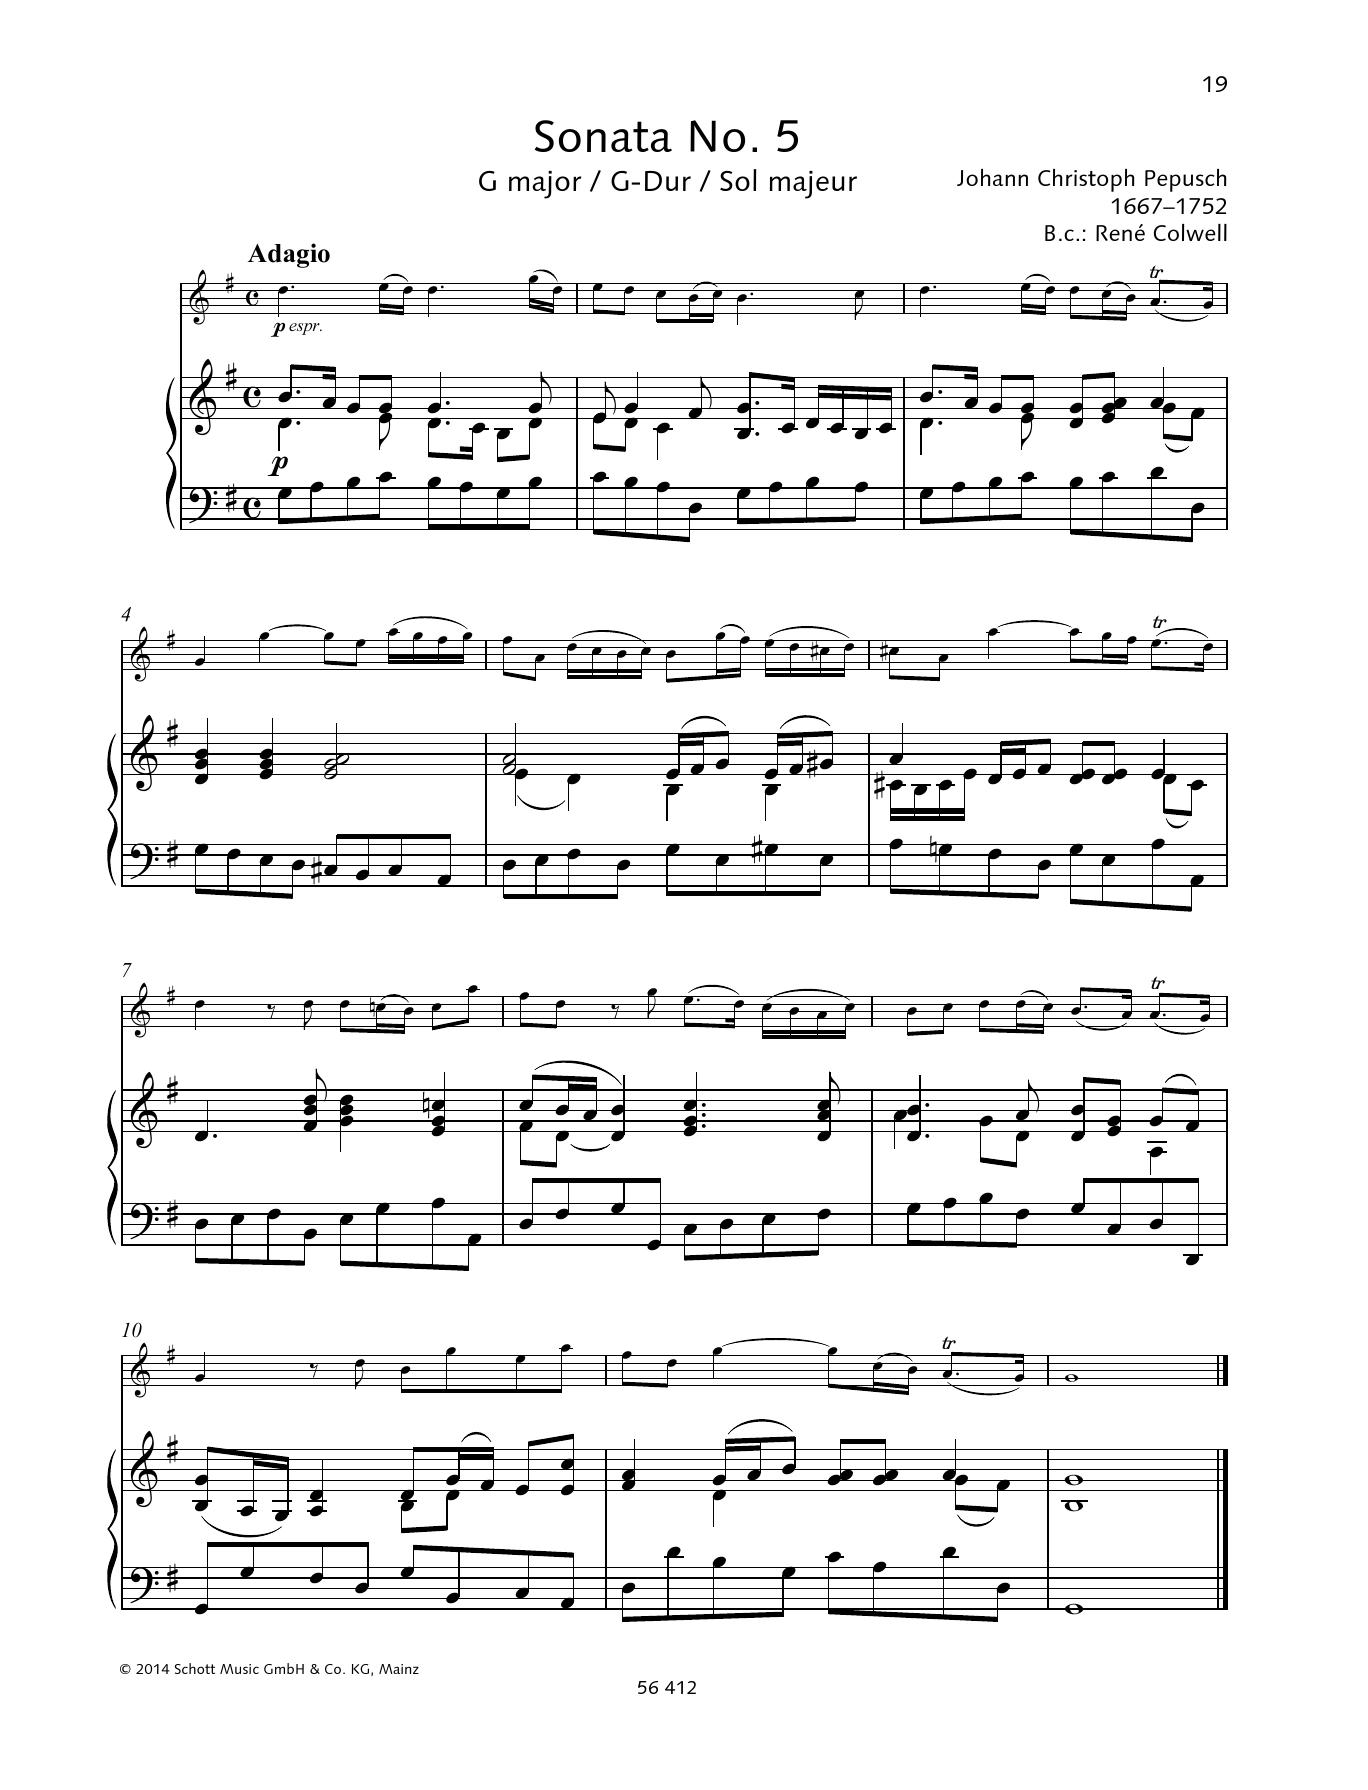 Sonata No. 5 G major